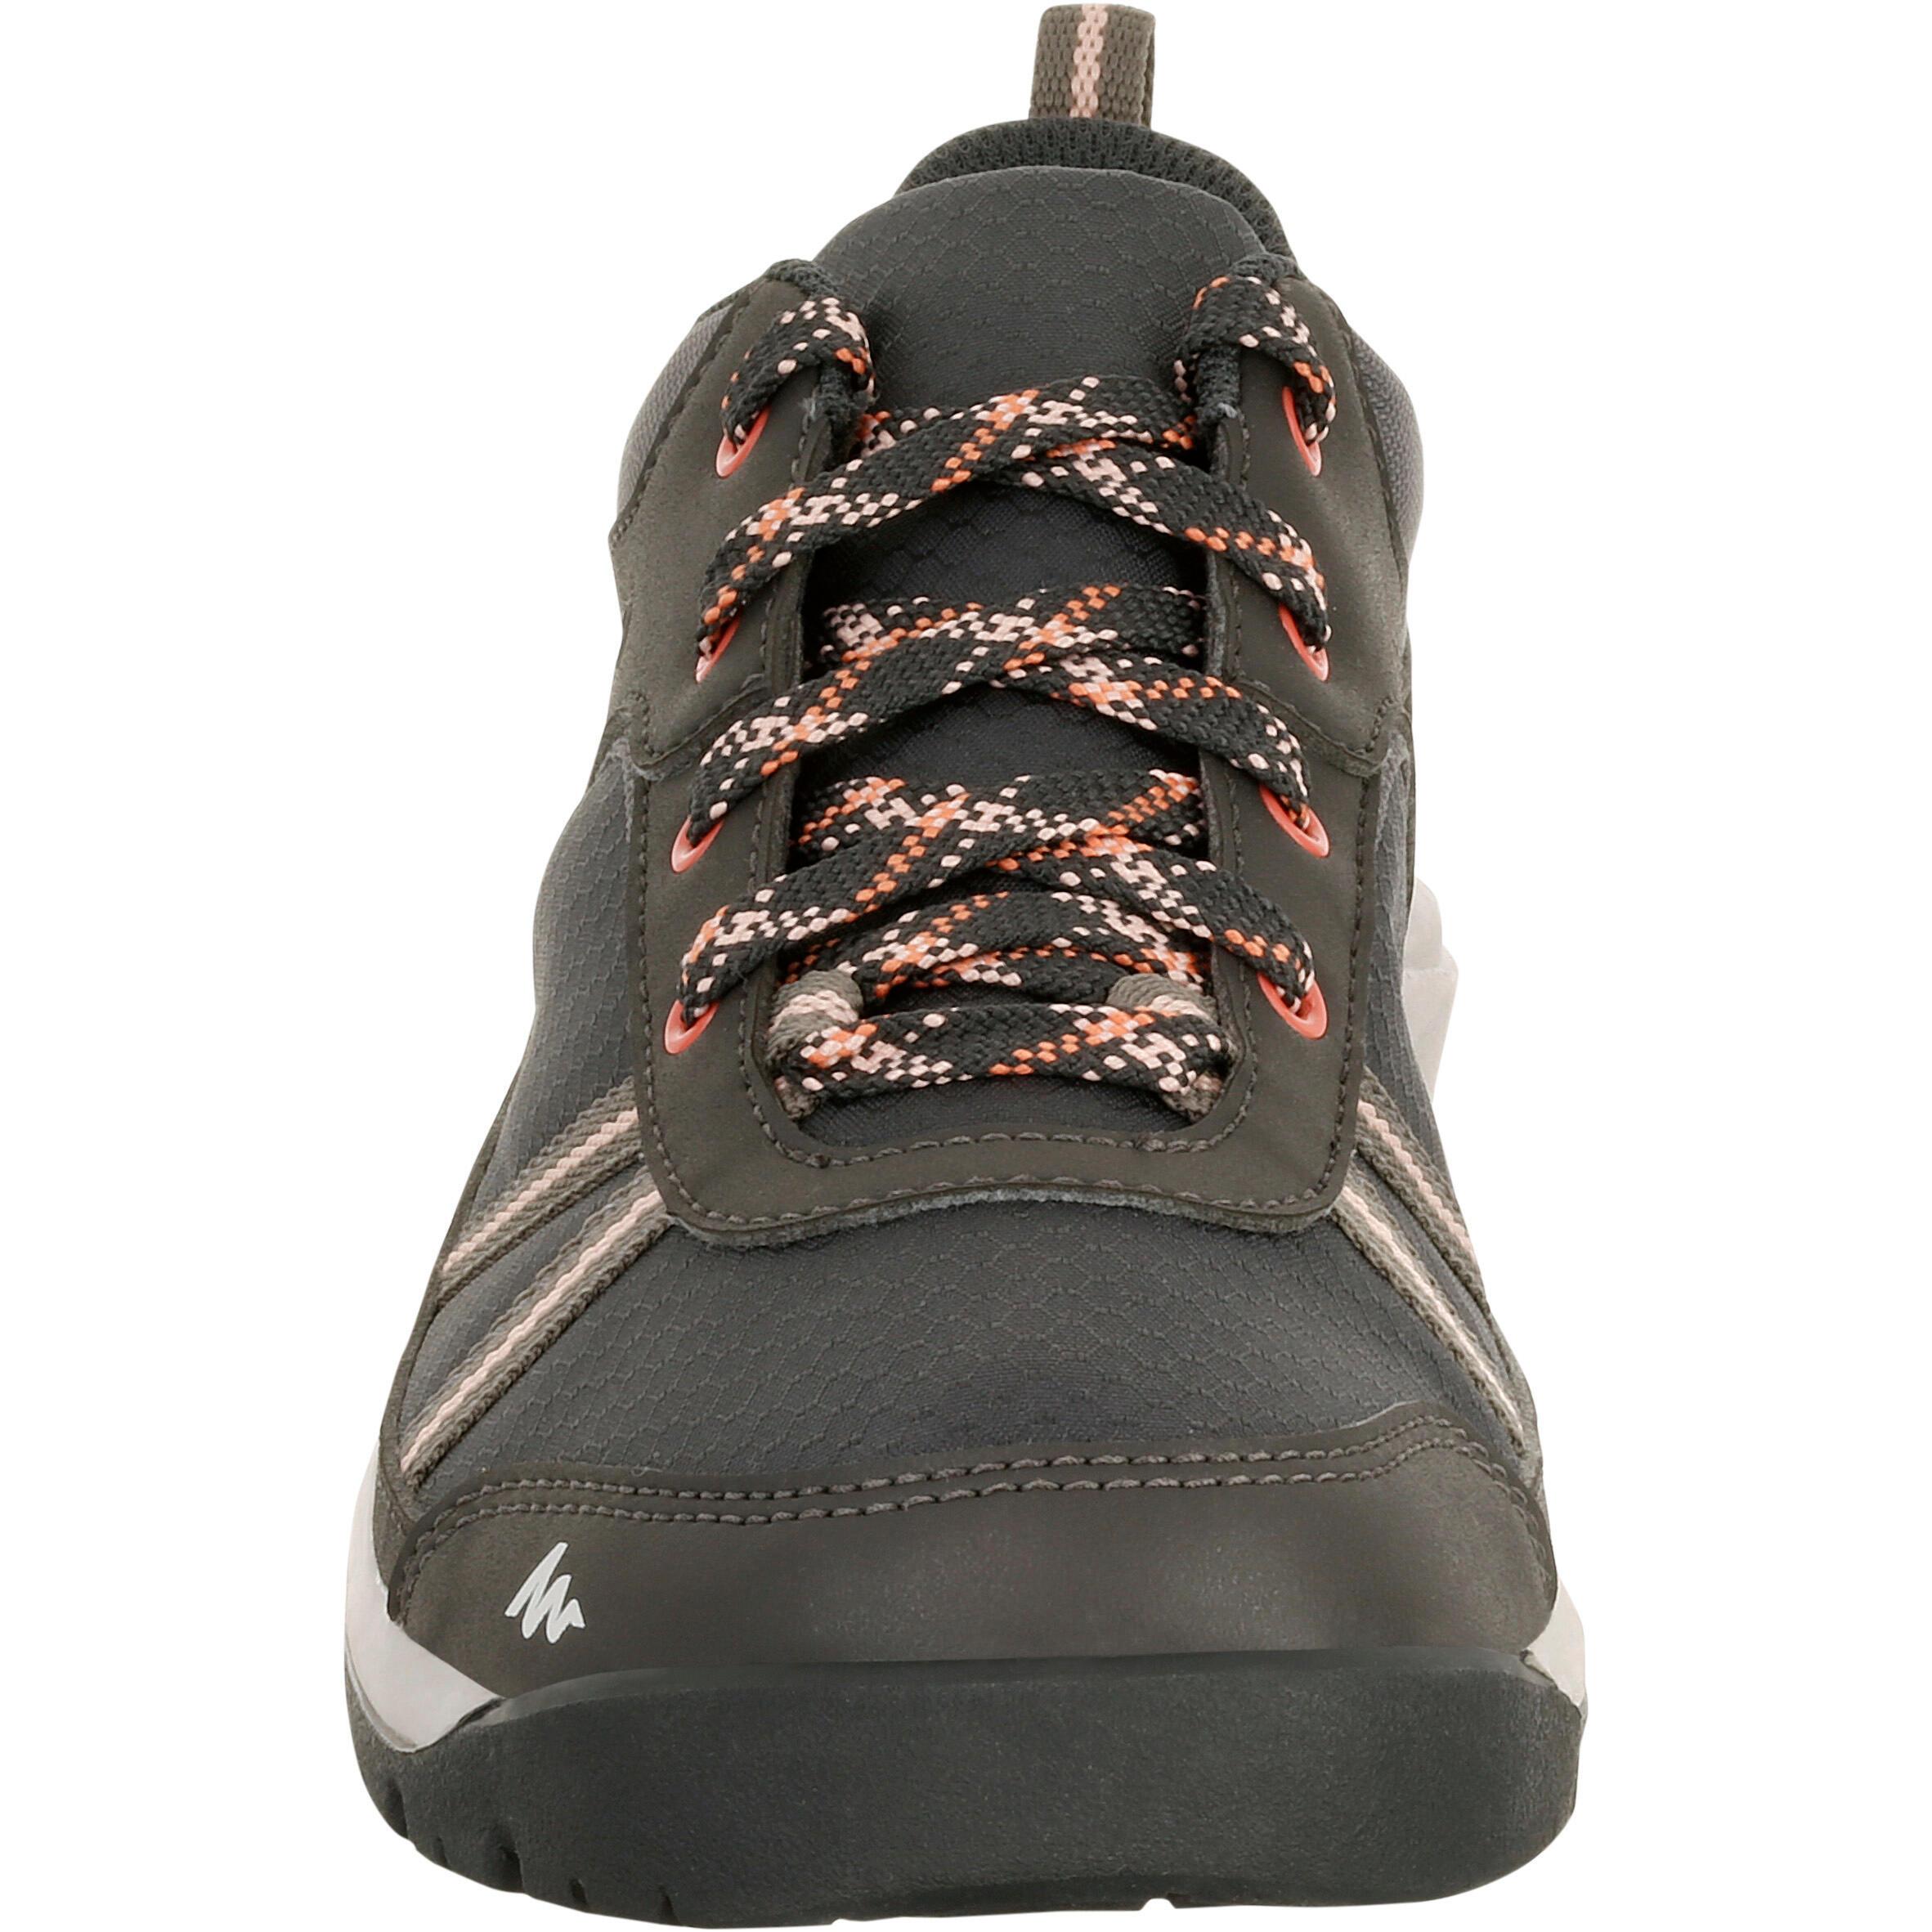 Women's Hiking Shoes NH300 (Waterproof) - Black